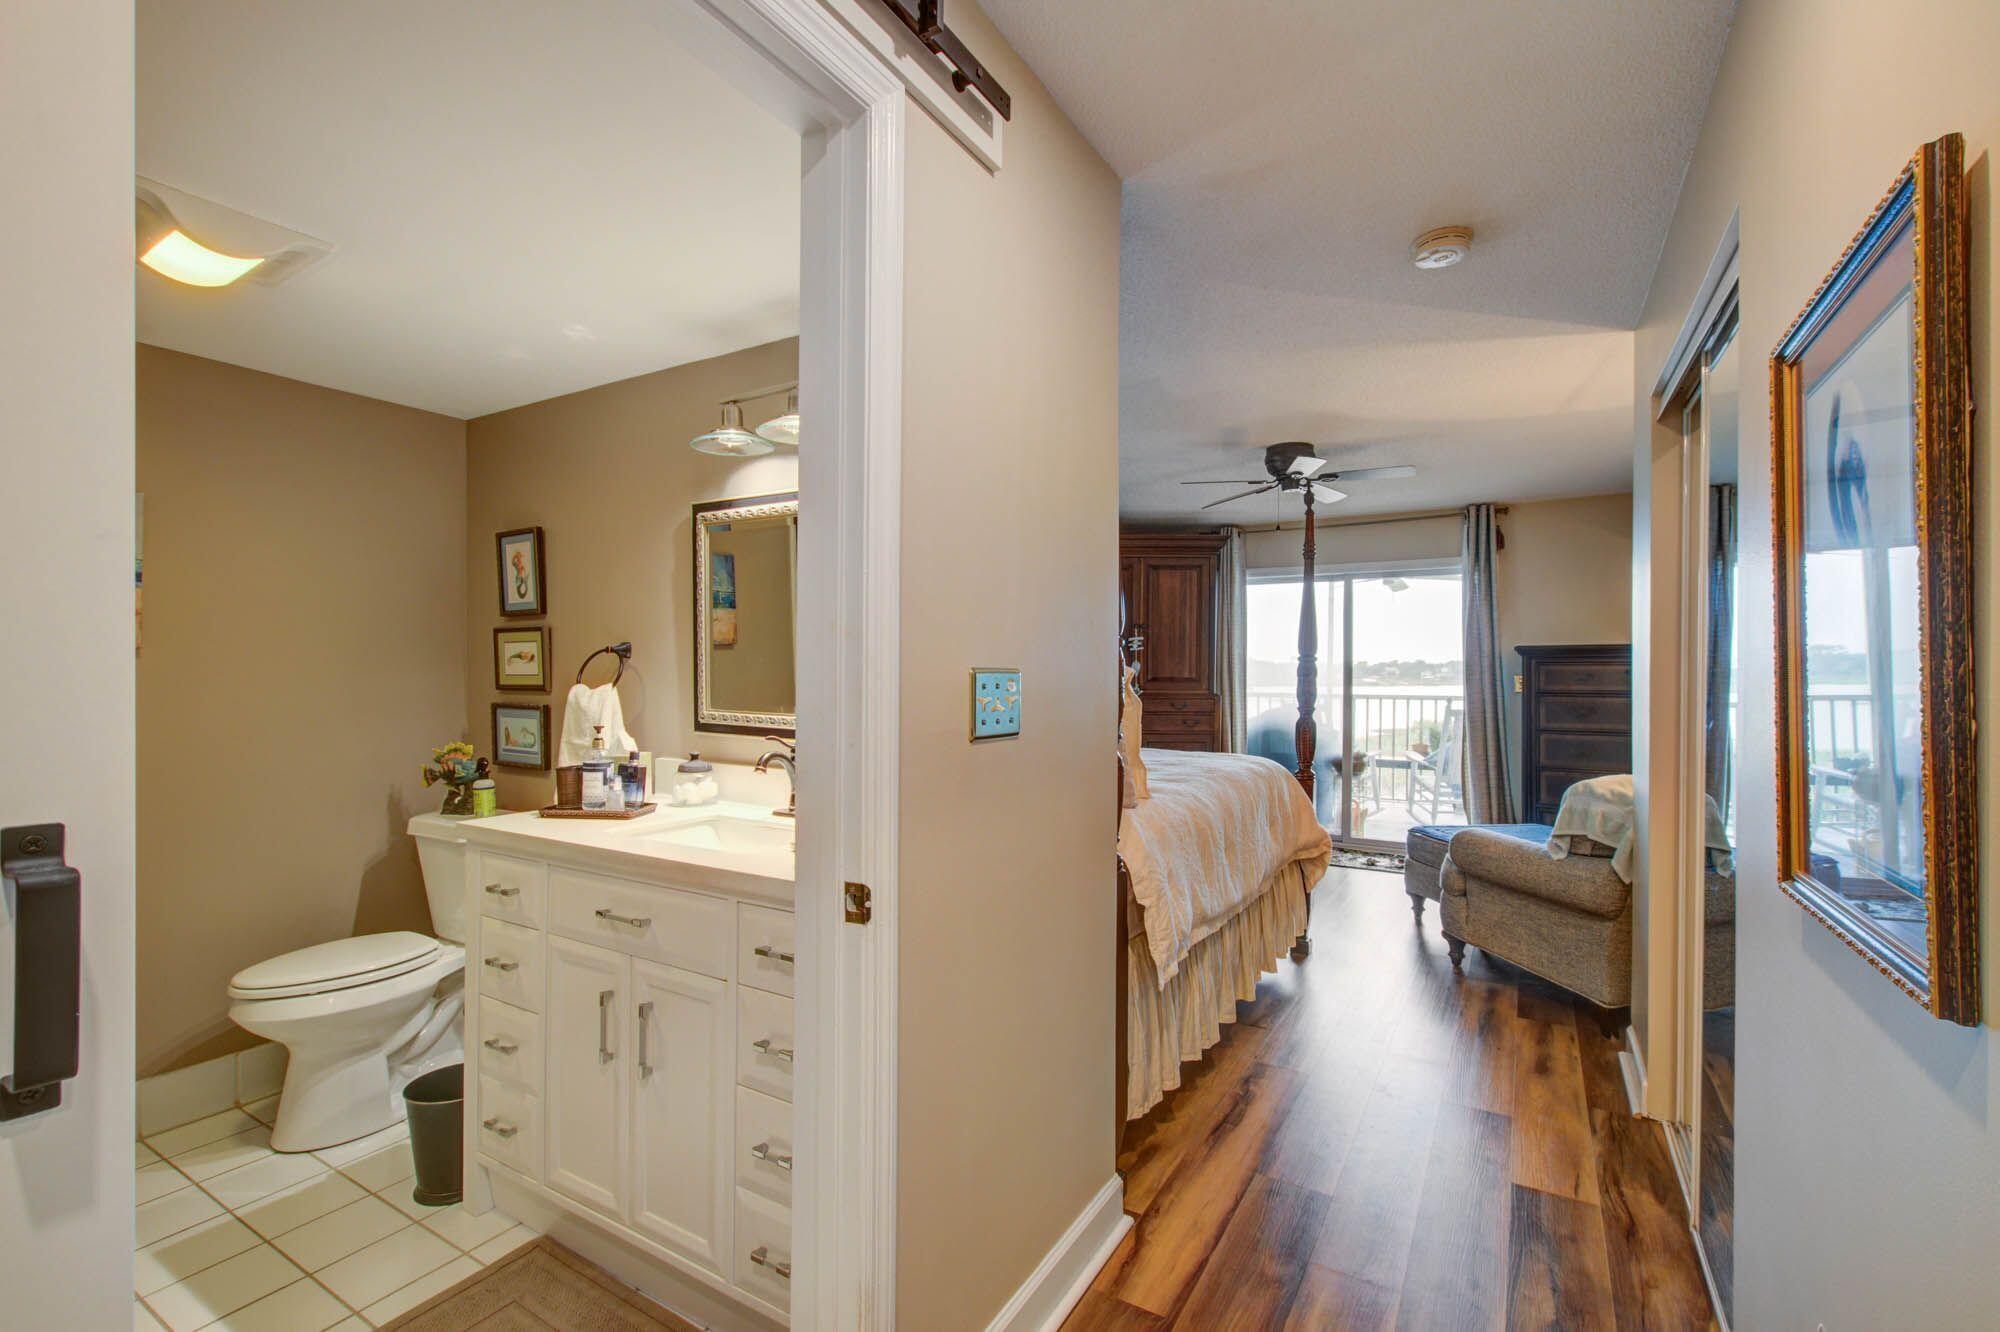 Turn of River Homes For Sale - 2395 Folly, Folly Beach, SC - 2